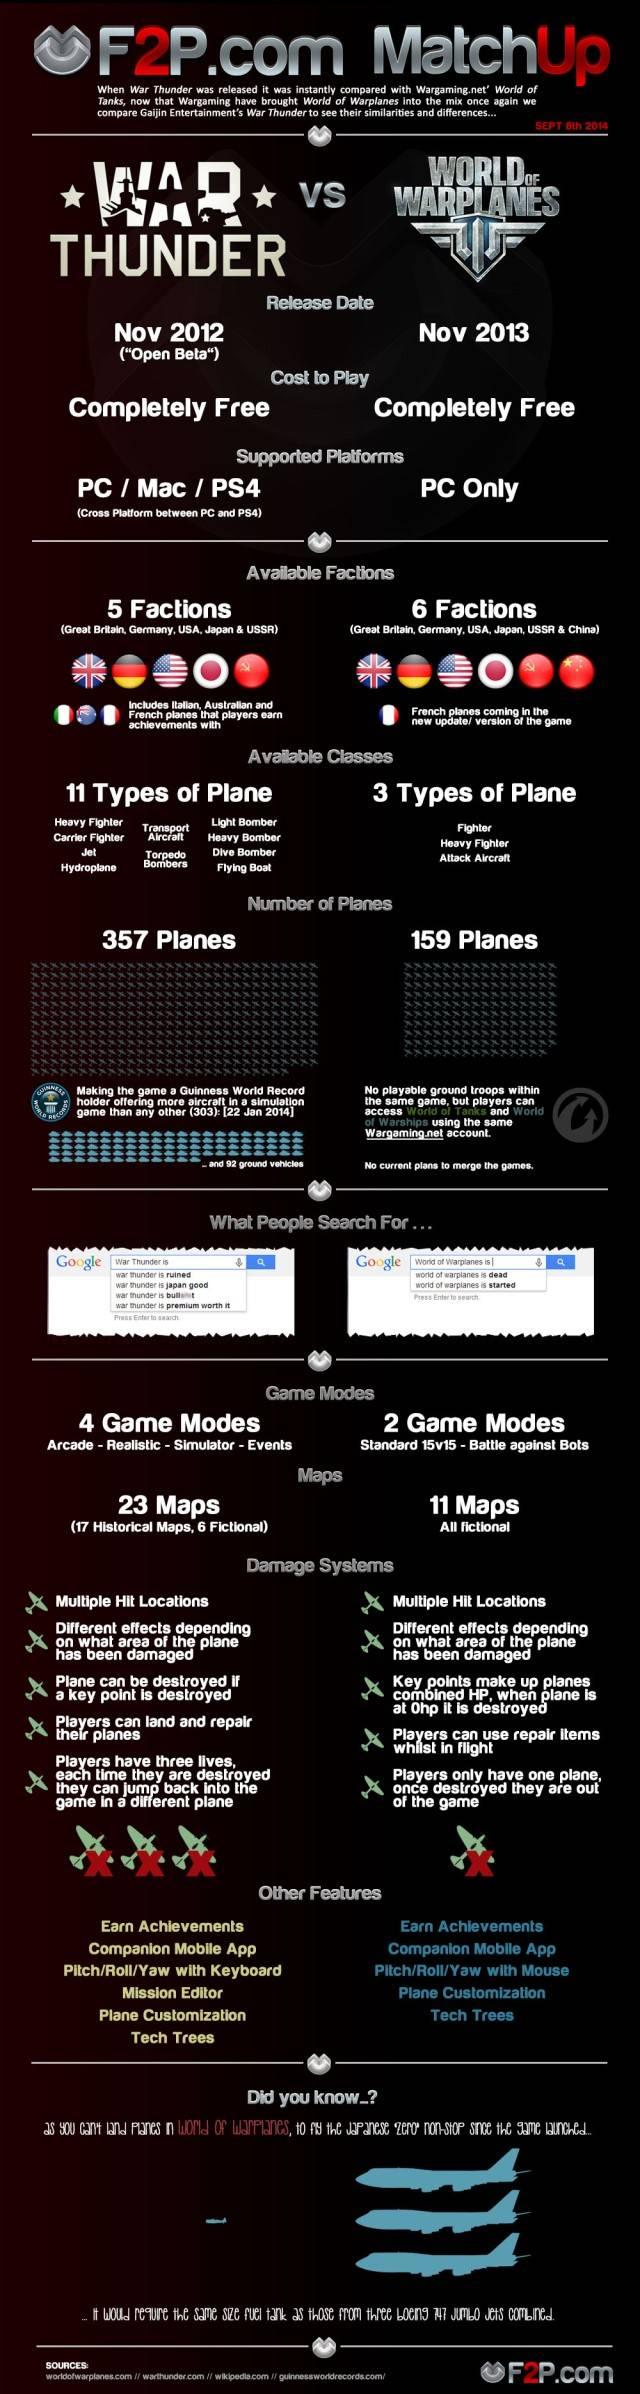 War Thunder v WoP - Infographic 640